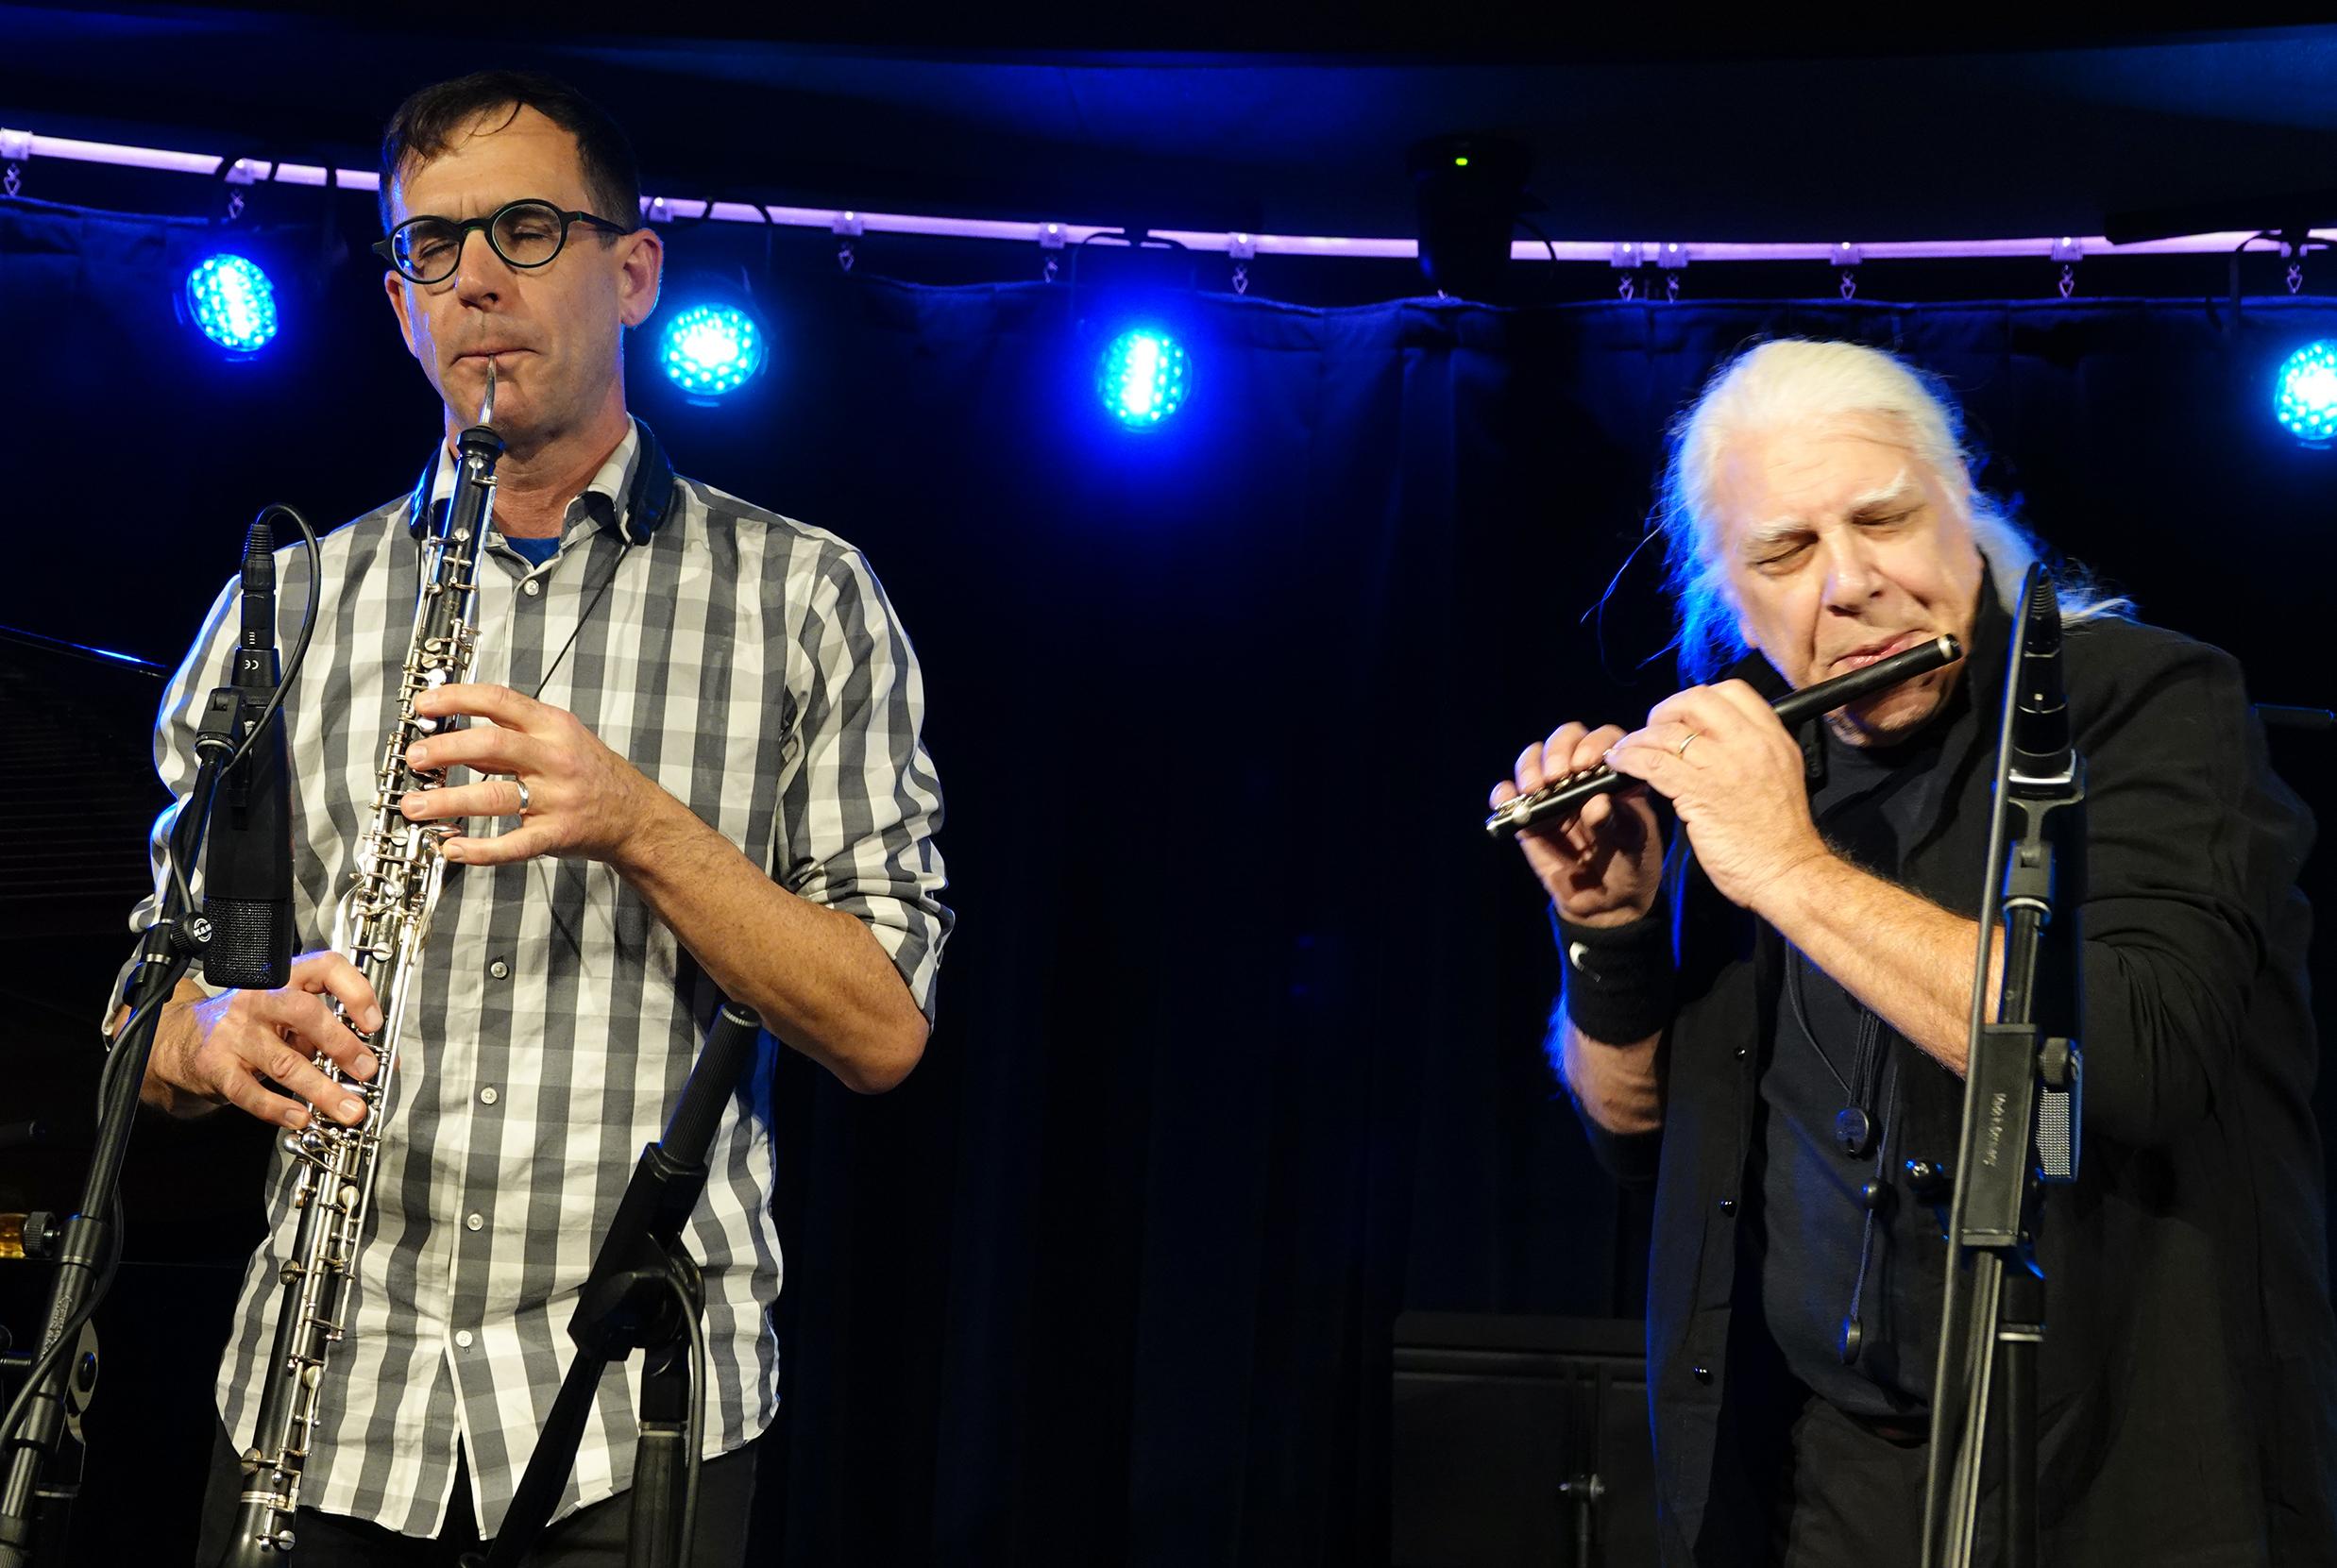 Kyle Bruckmann & Vinny Golia at 23rd Annual Edgefest 2019